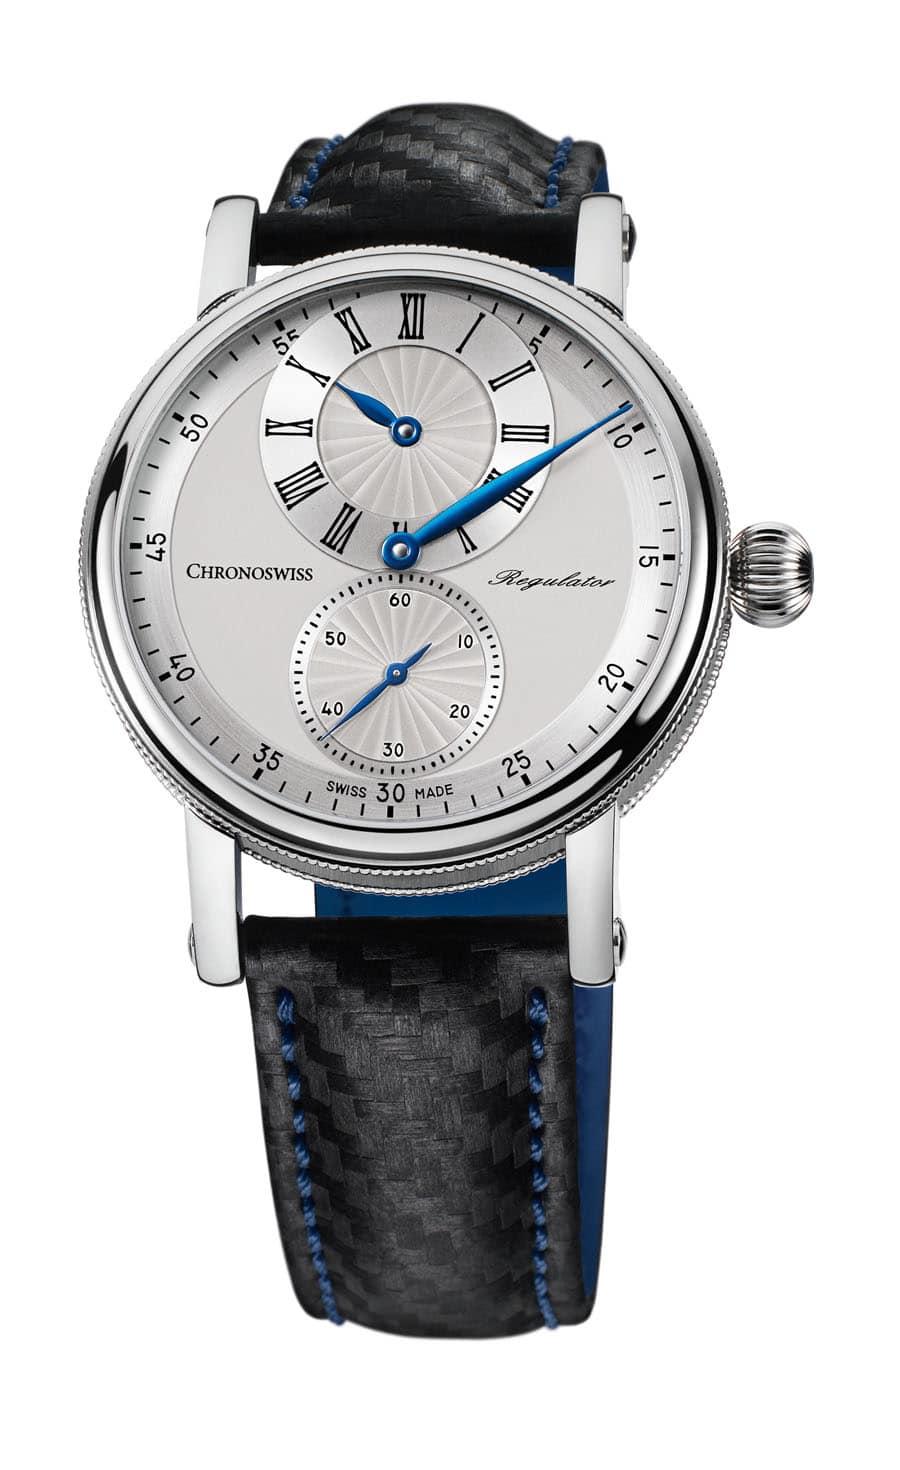 Chronoswiss: Sirius Regulator Classic in den Farben Silber und Blau